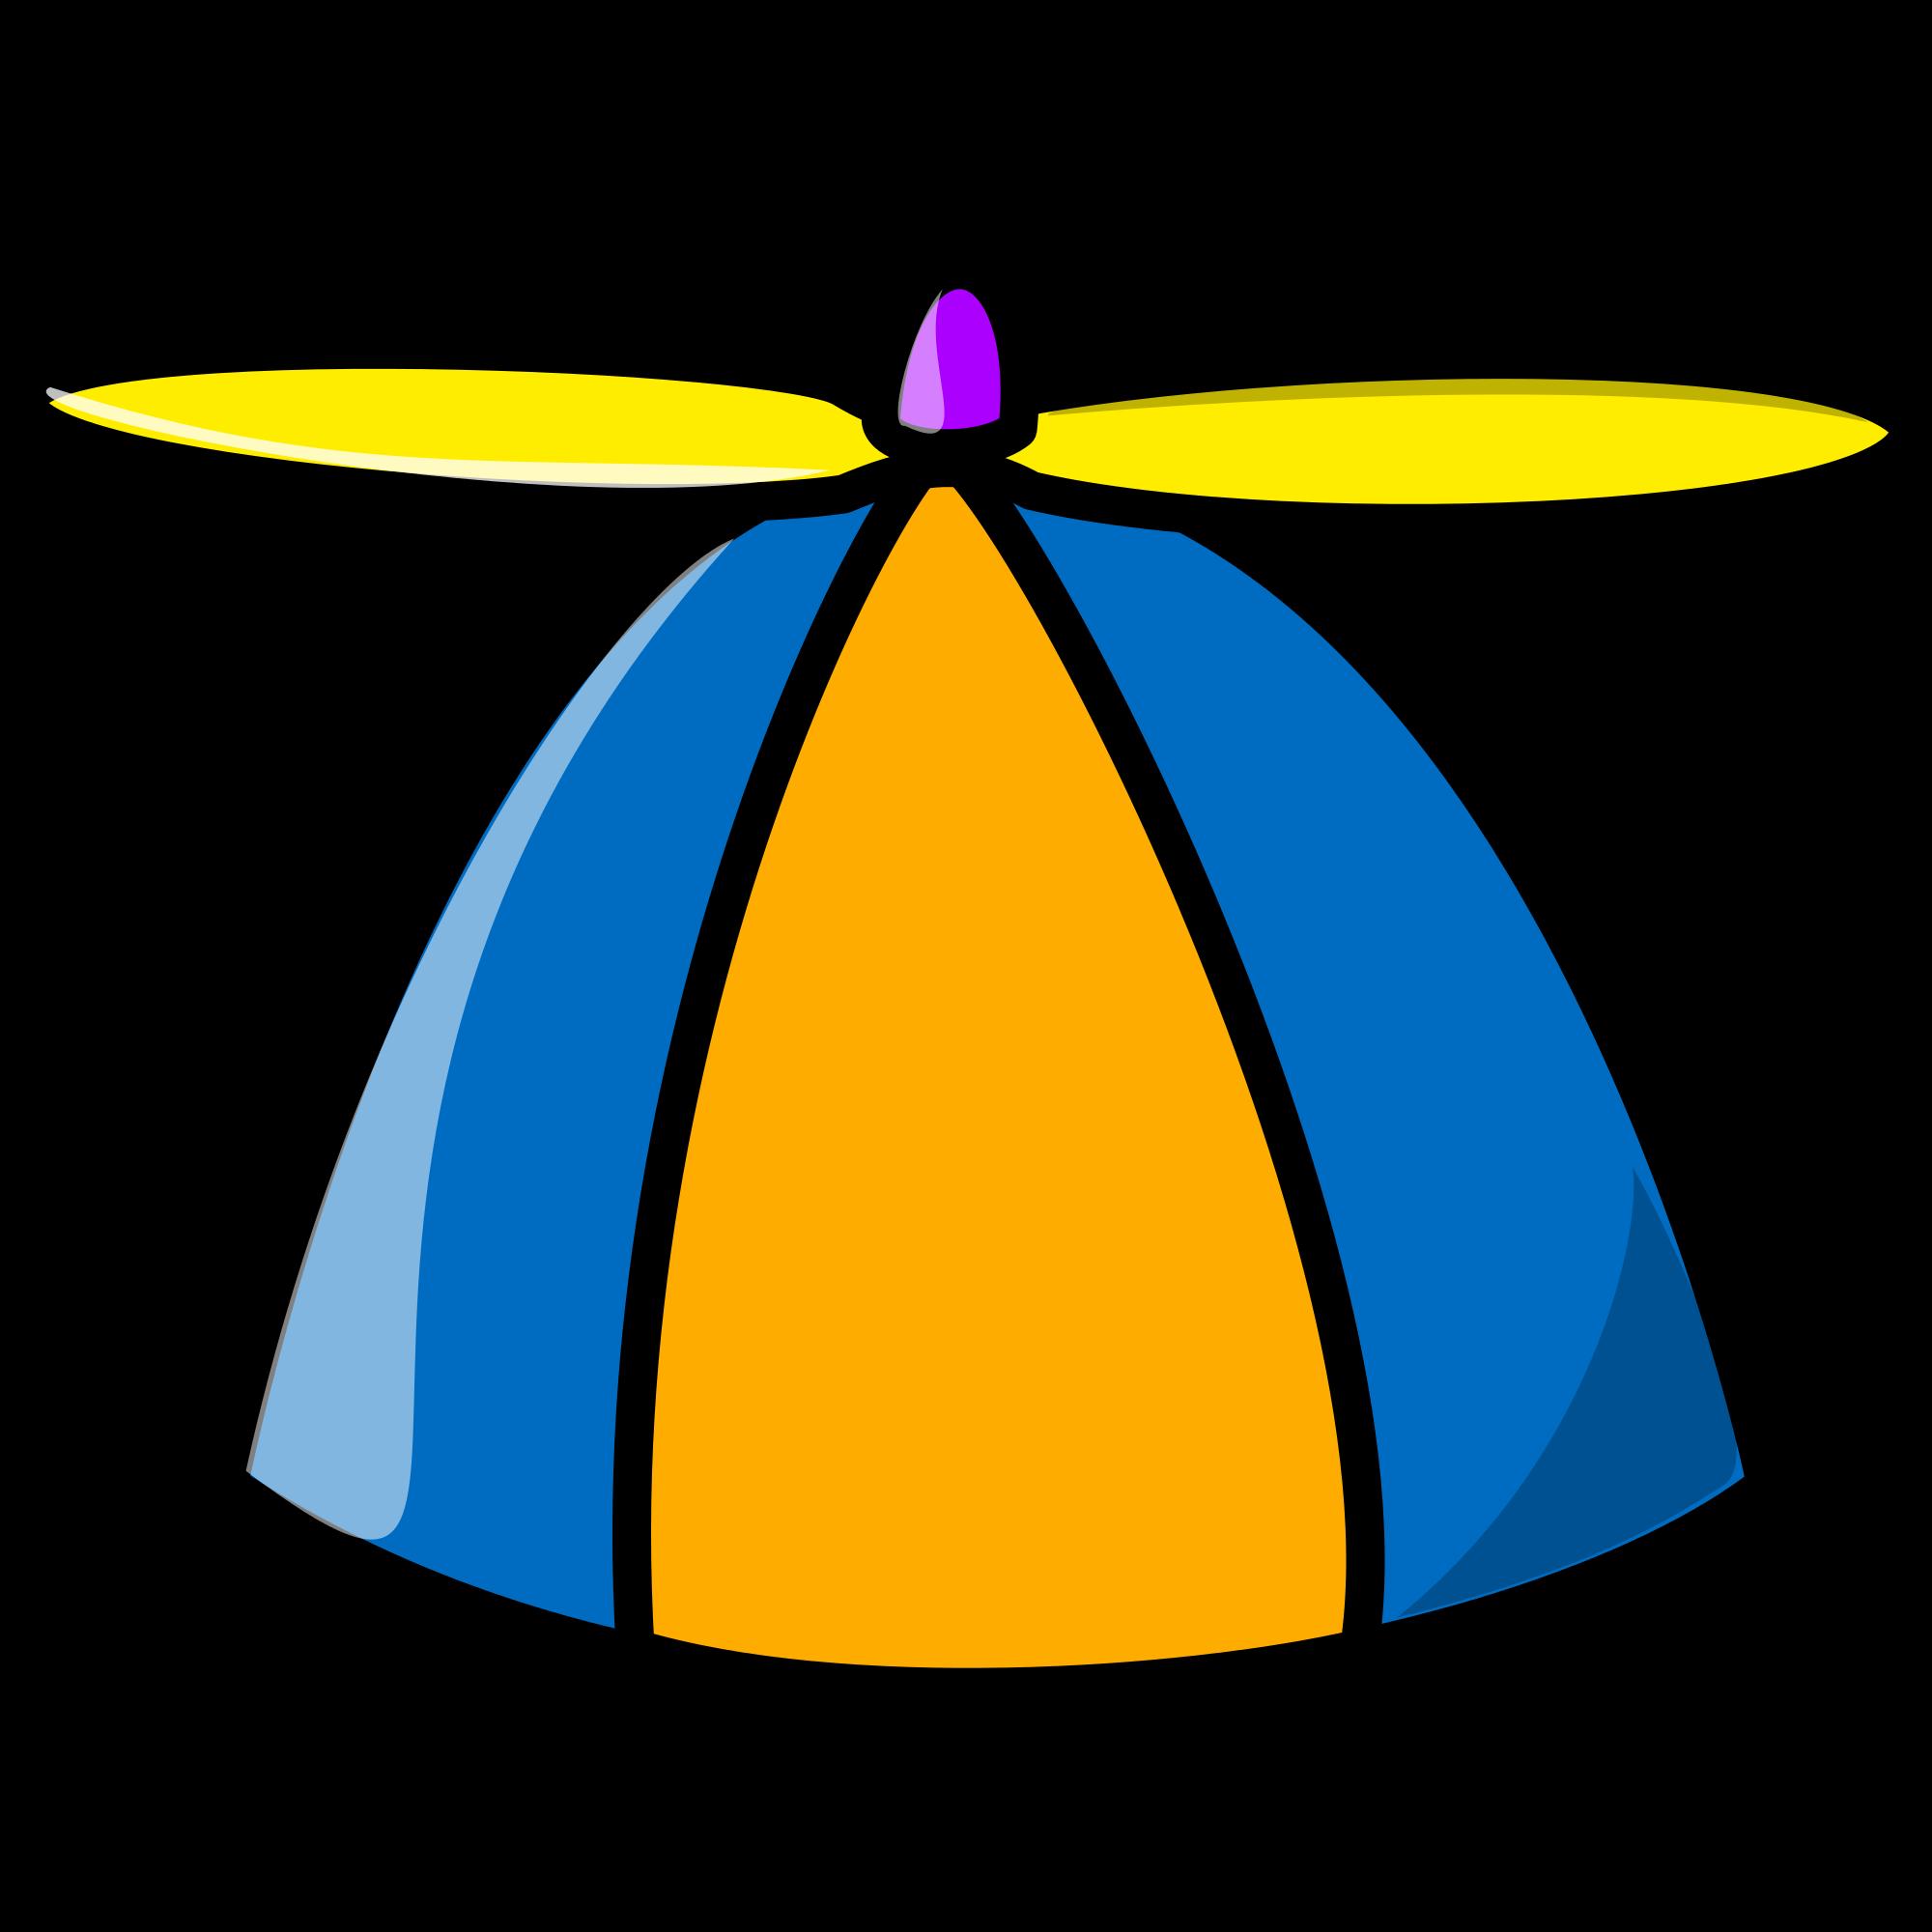 picture stock Beanie transparent propeller. Png file tux paint